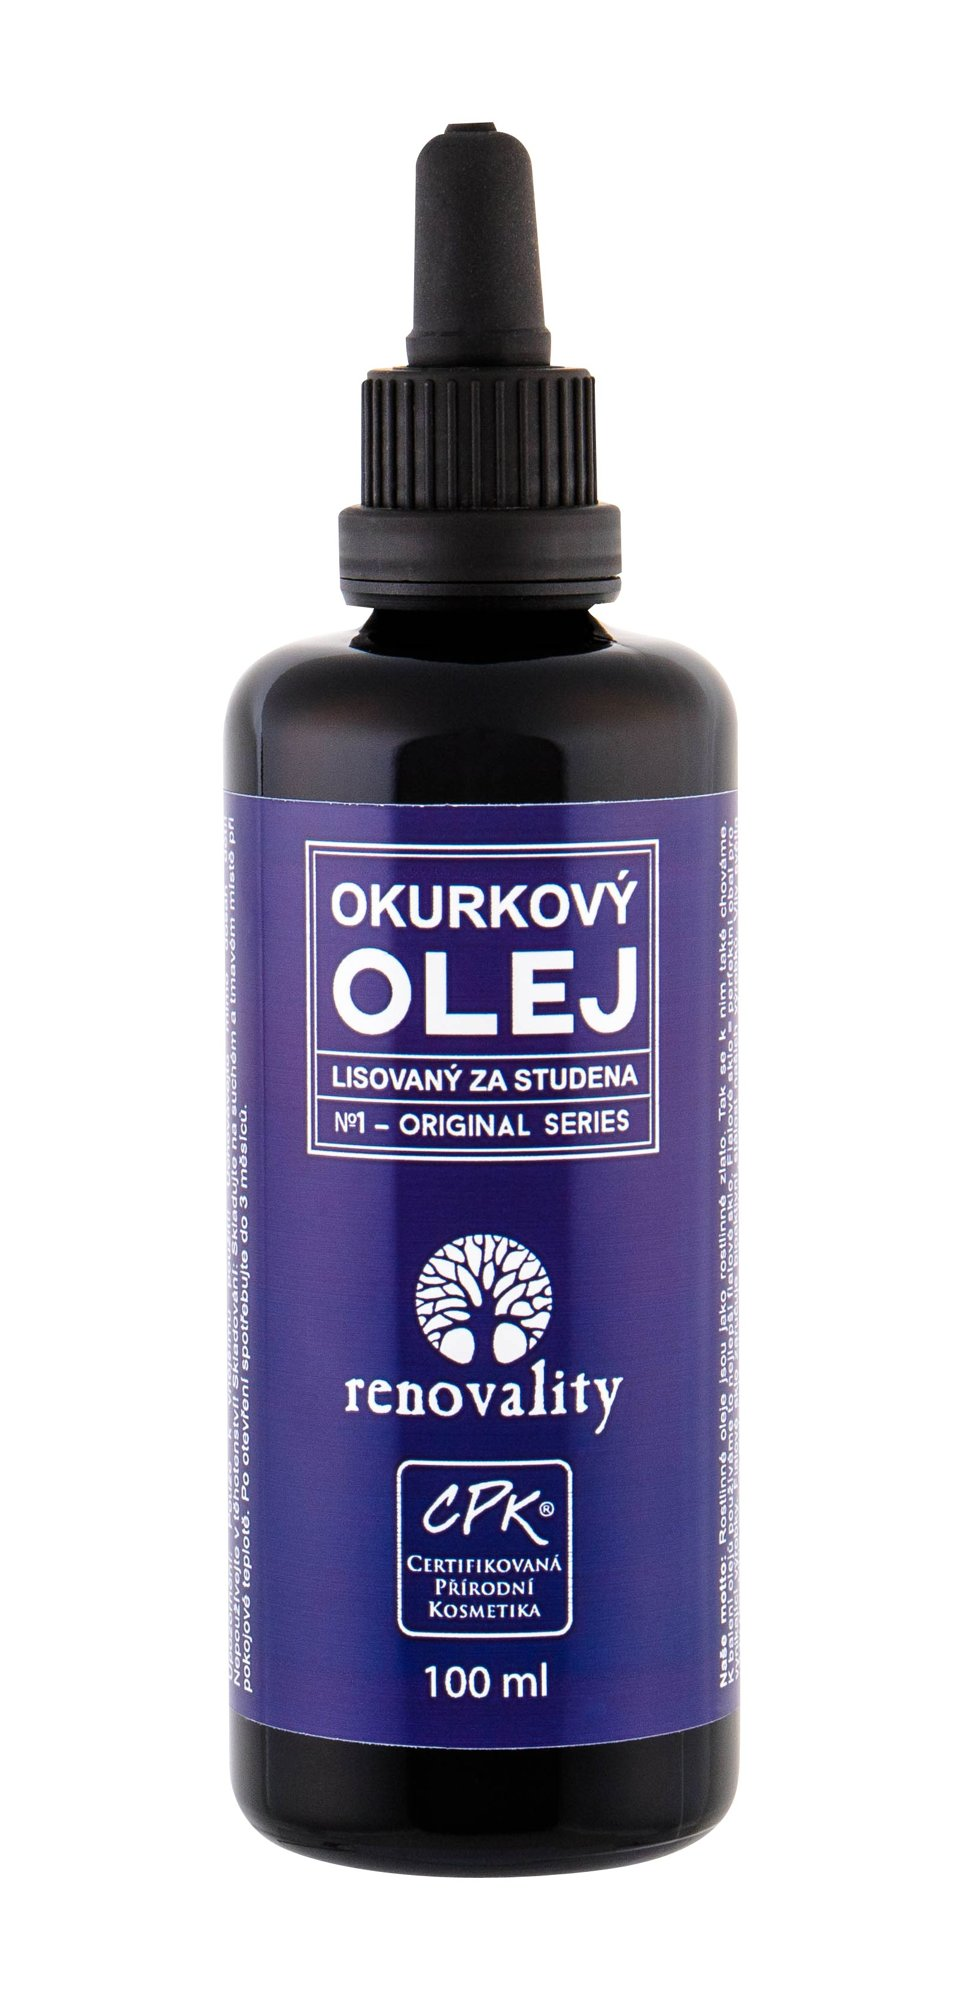 Renovality Original Series Body Oil 100ml  Cucumber Oil